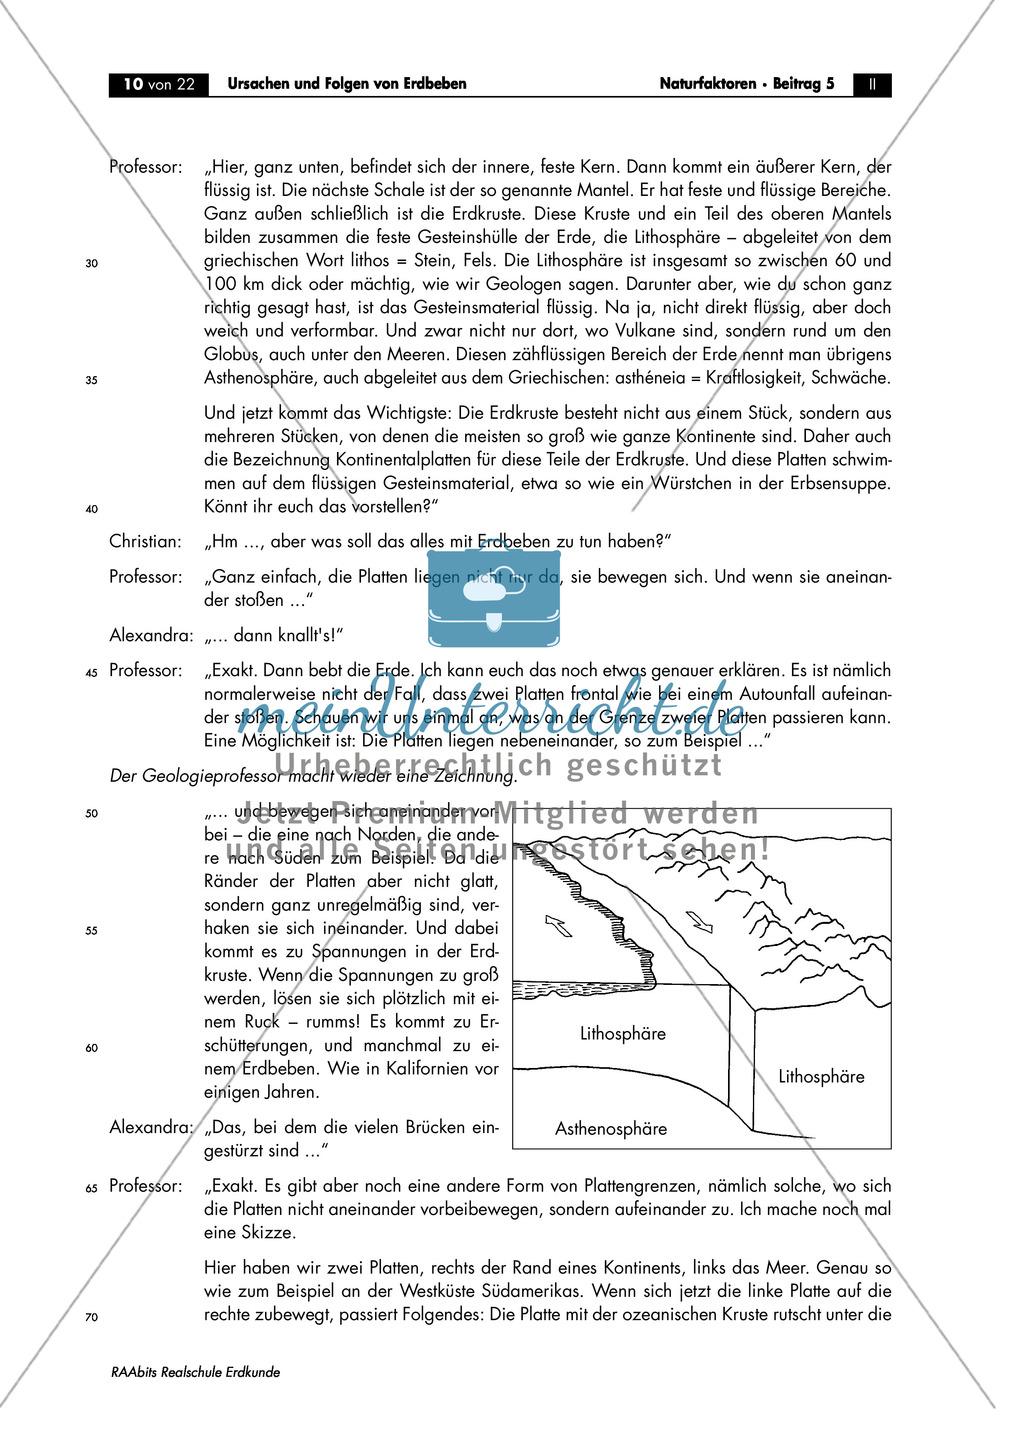 Erdbeben: Ursache endogener Vorgänge + Schalenaufbau der Erde Preview 1